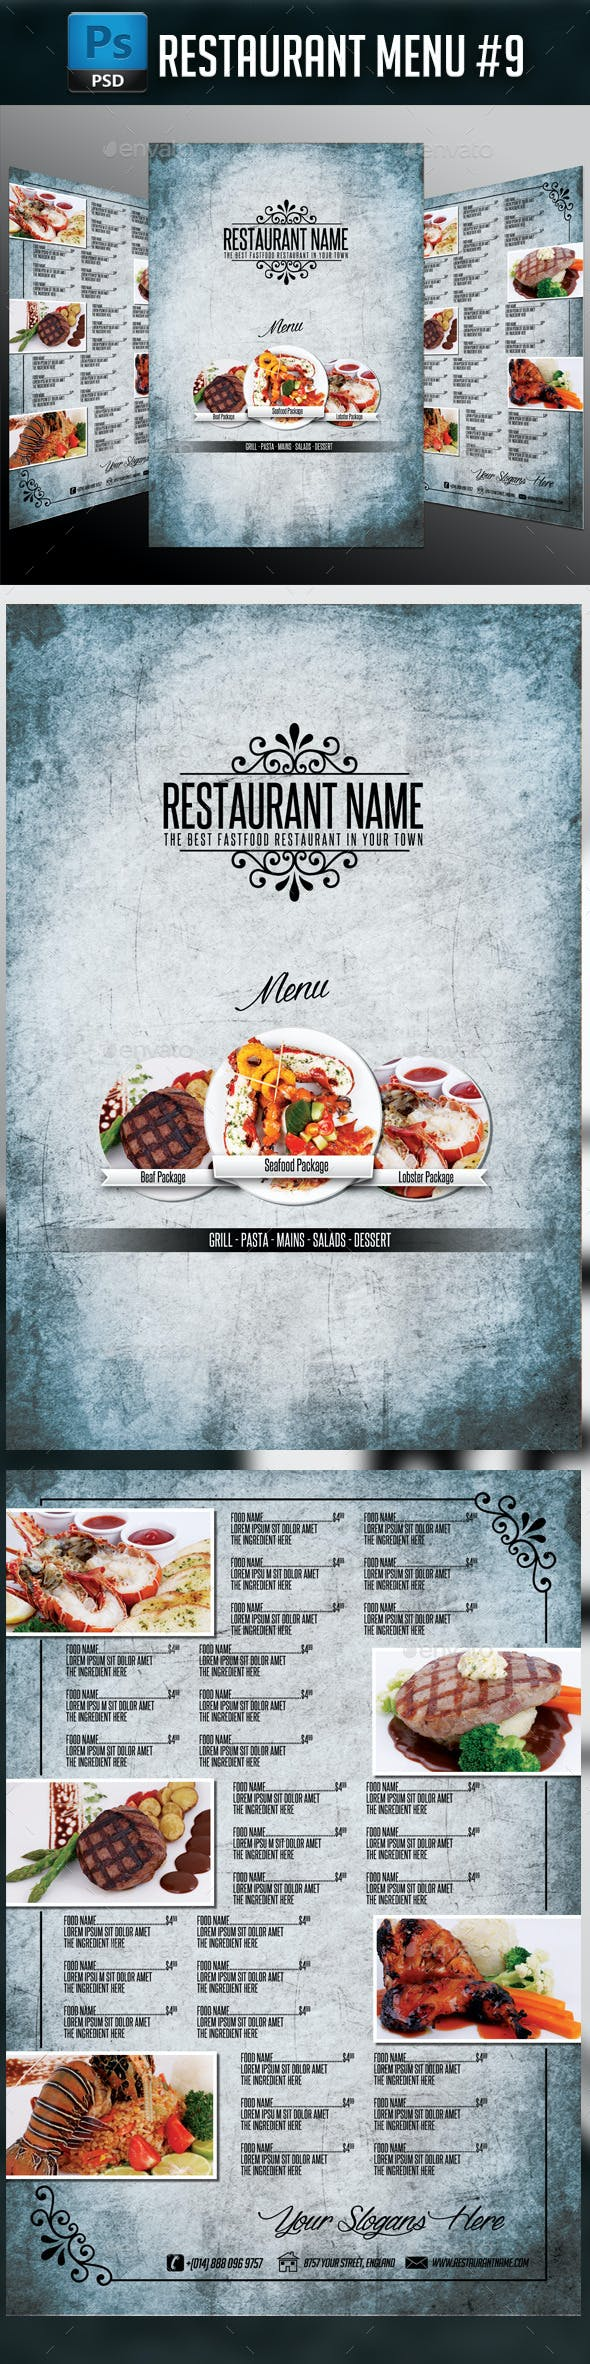 Restaurant Menu #9